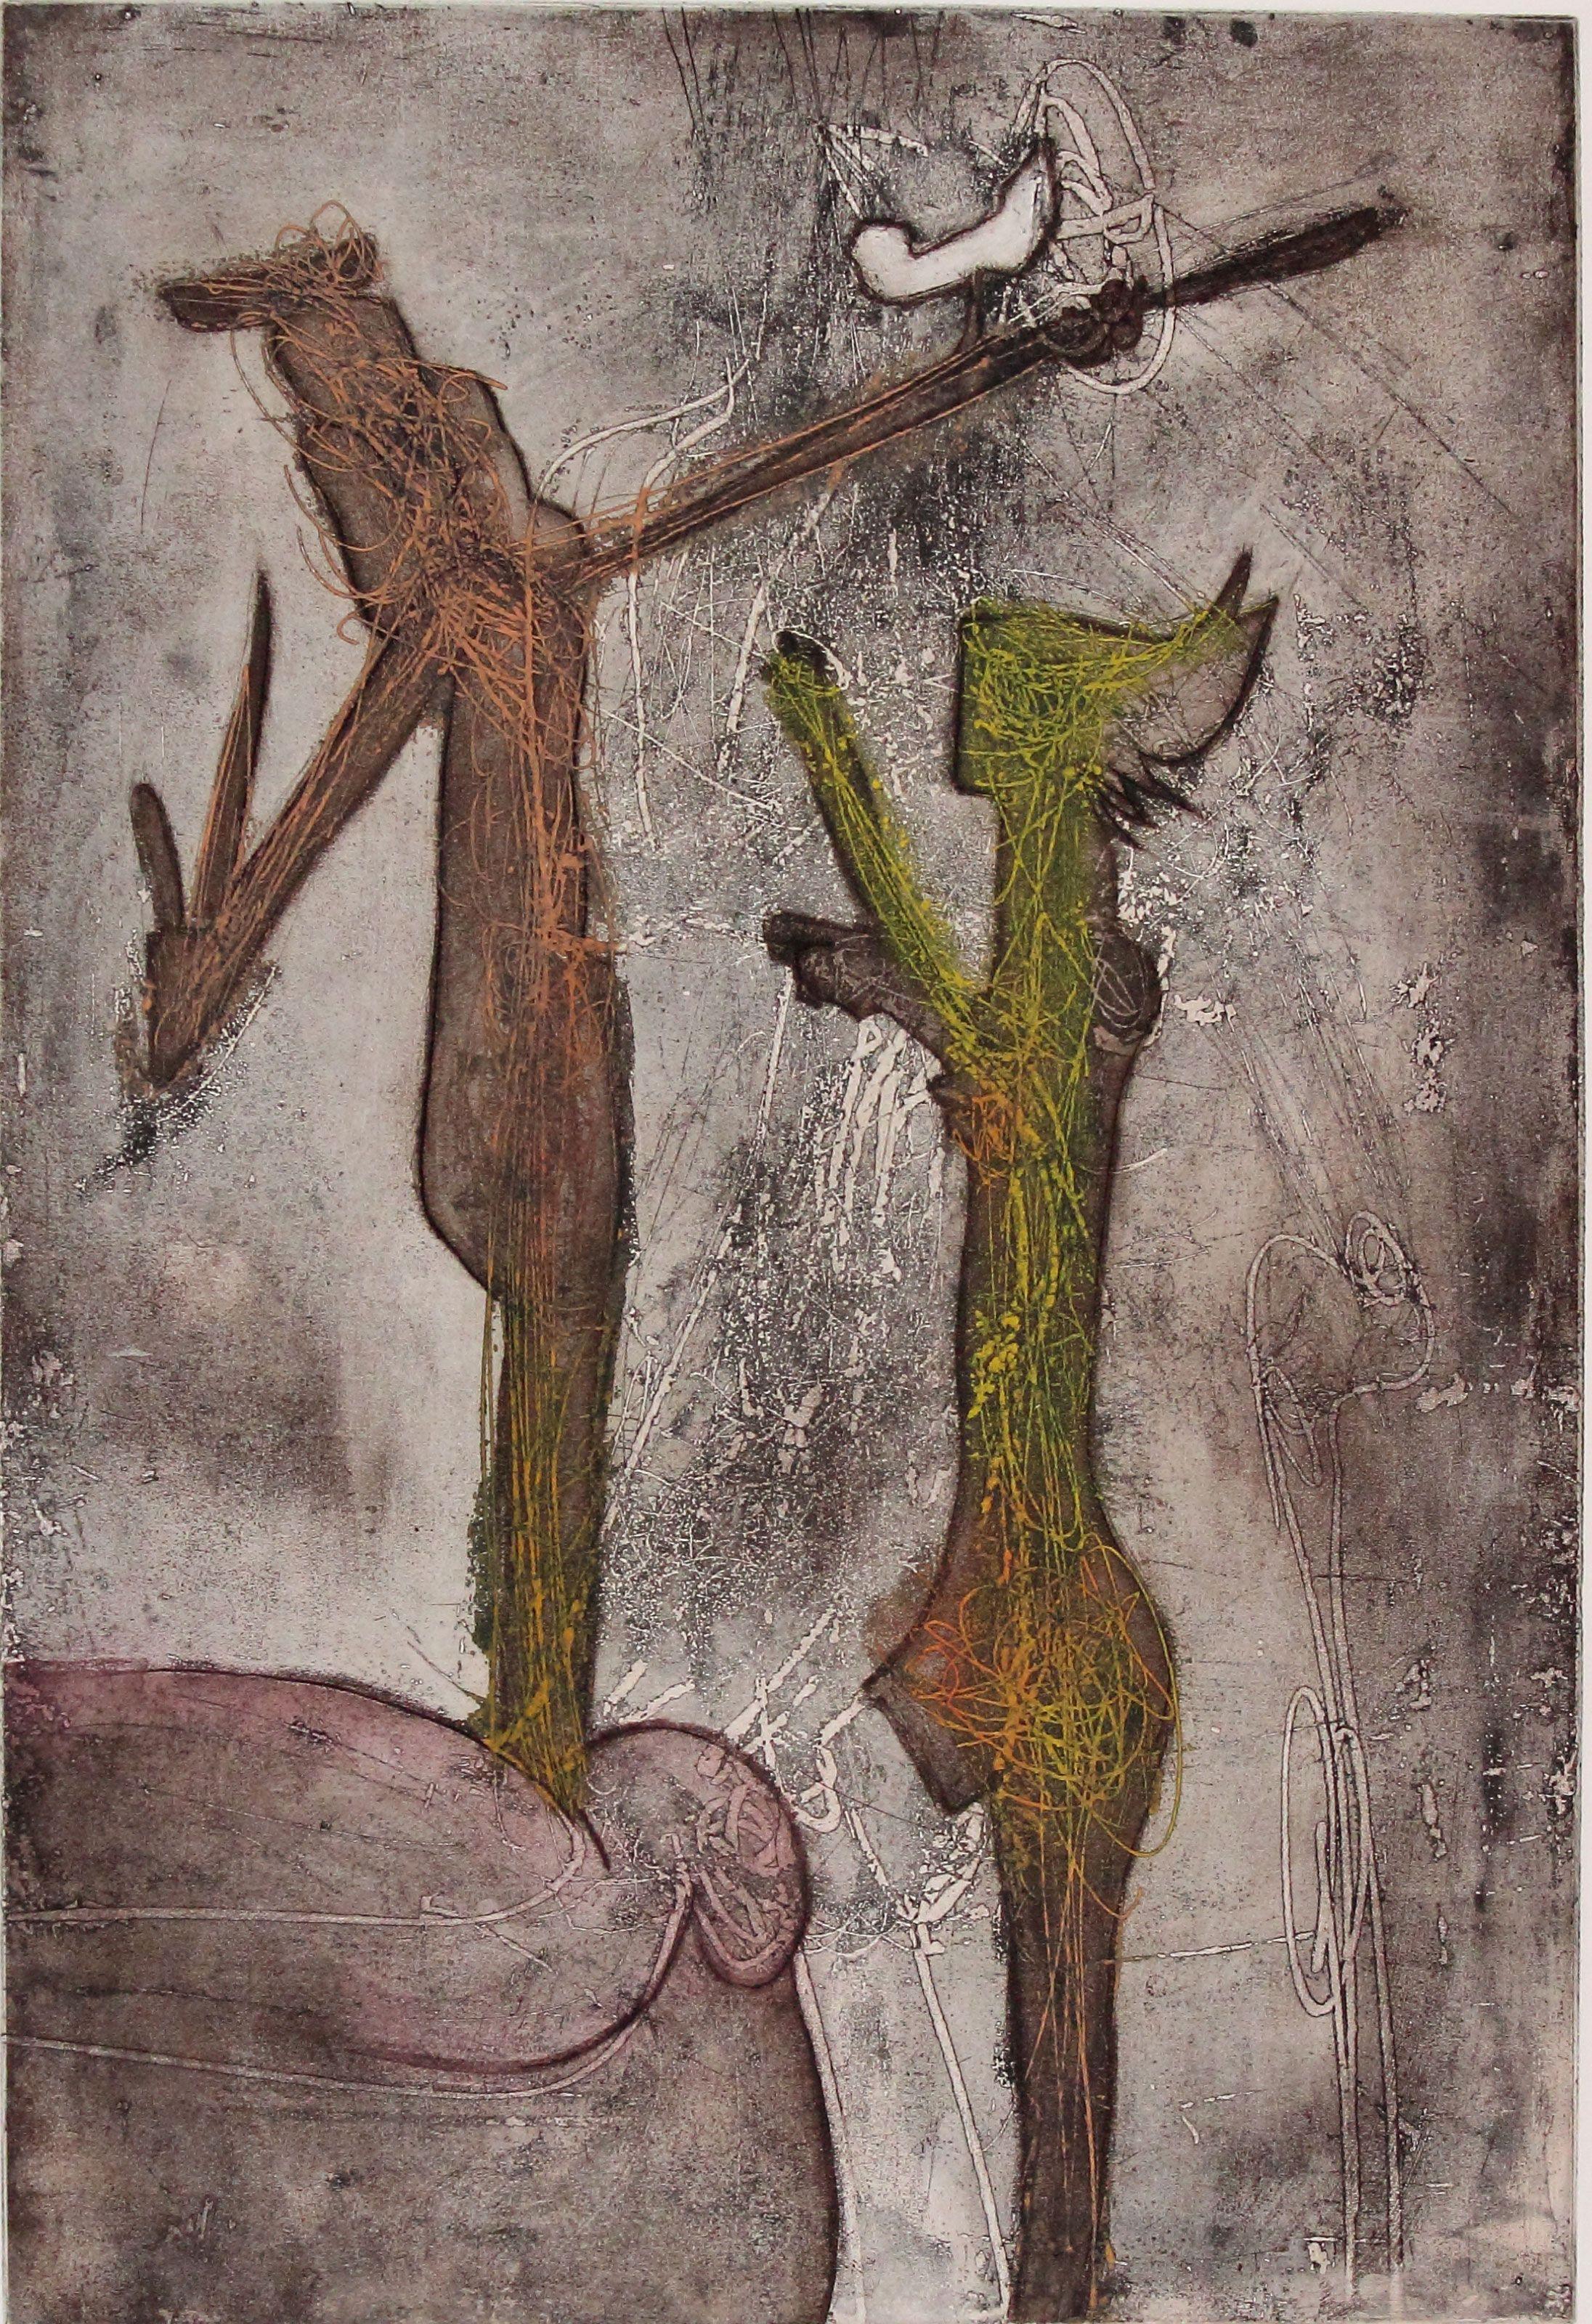 Roberto Sebastian Matta, Personnage I, 1966, acquaforte acquatinta, 75 x 55,5 cm, firmata, E.A.